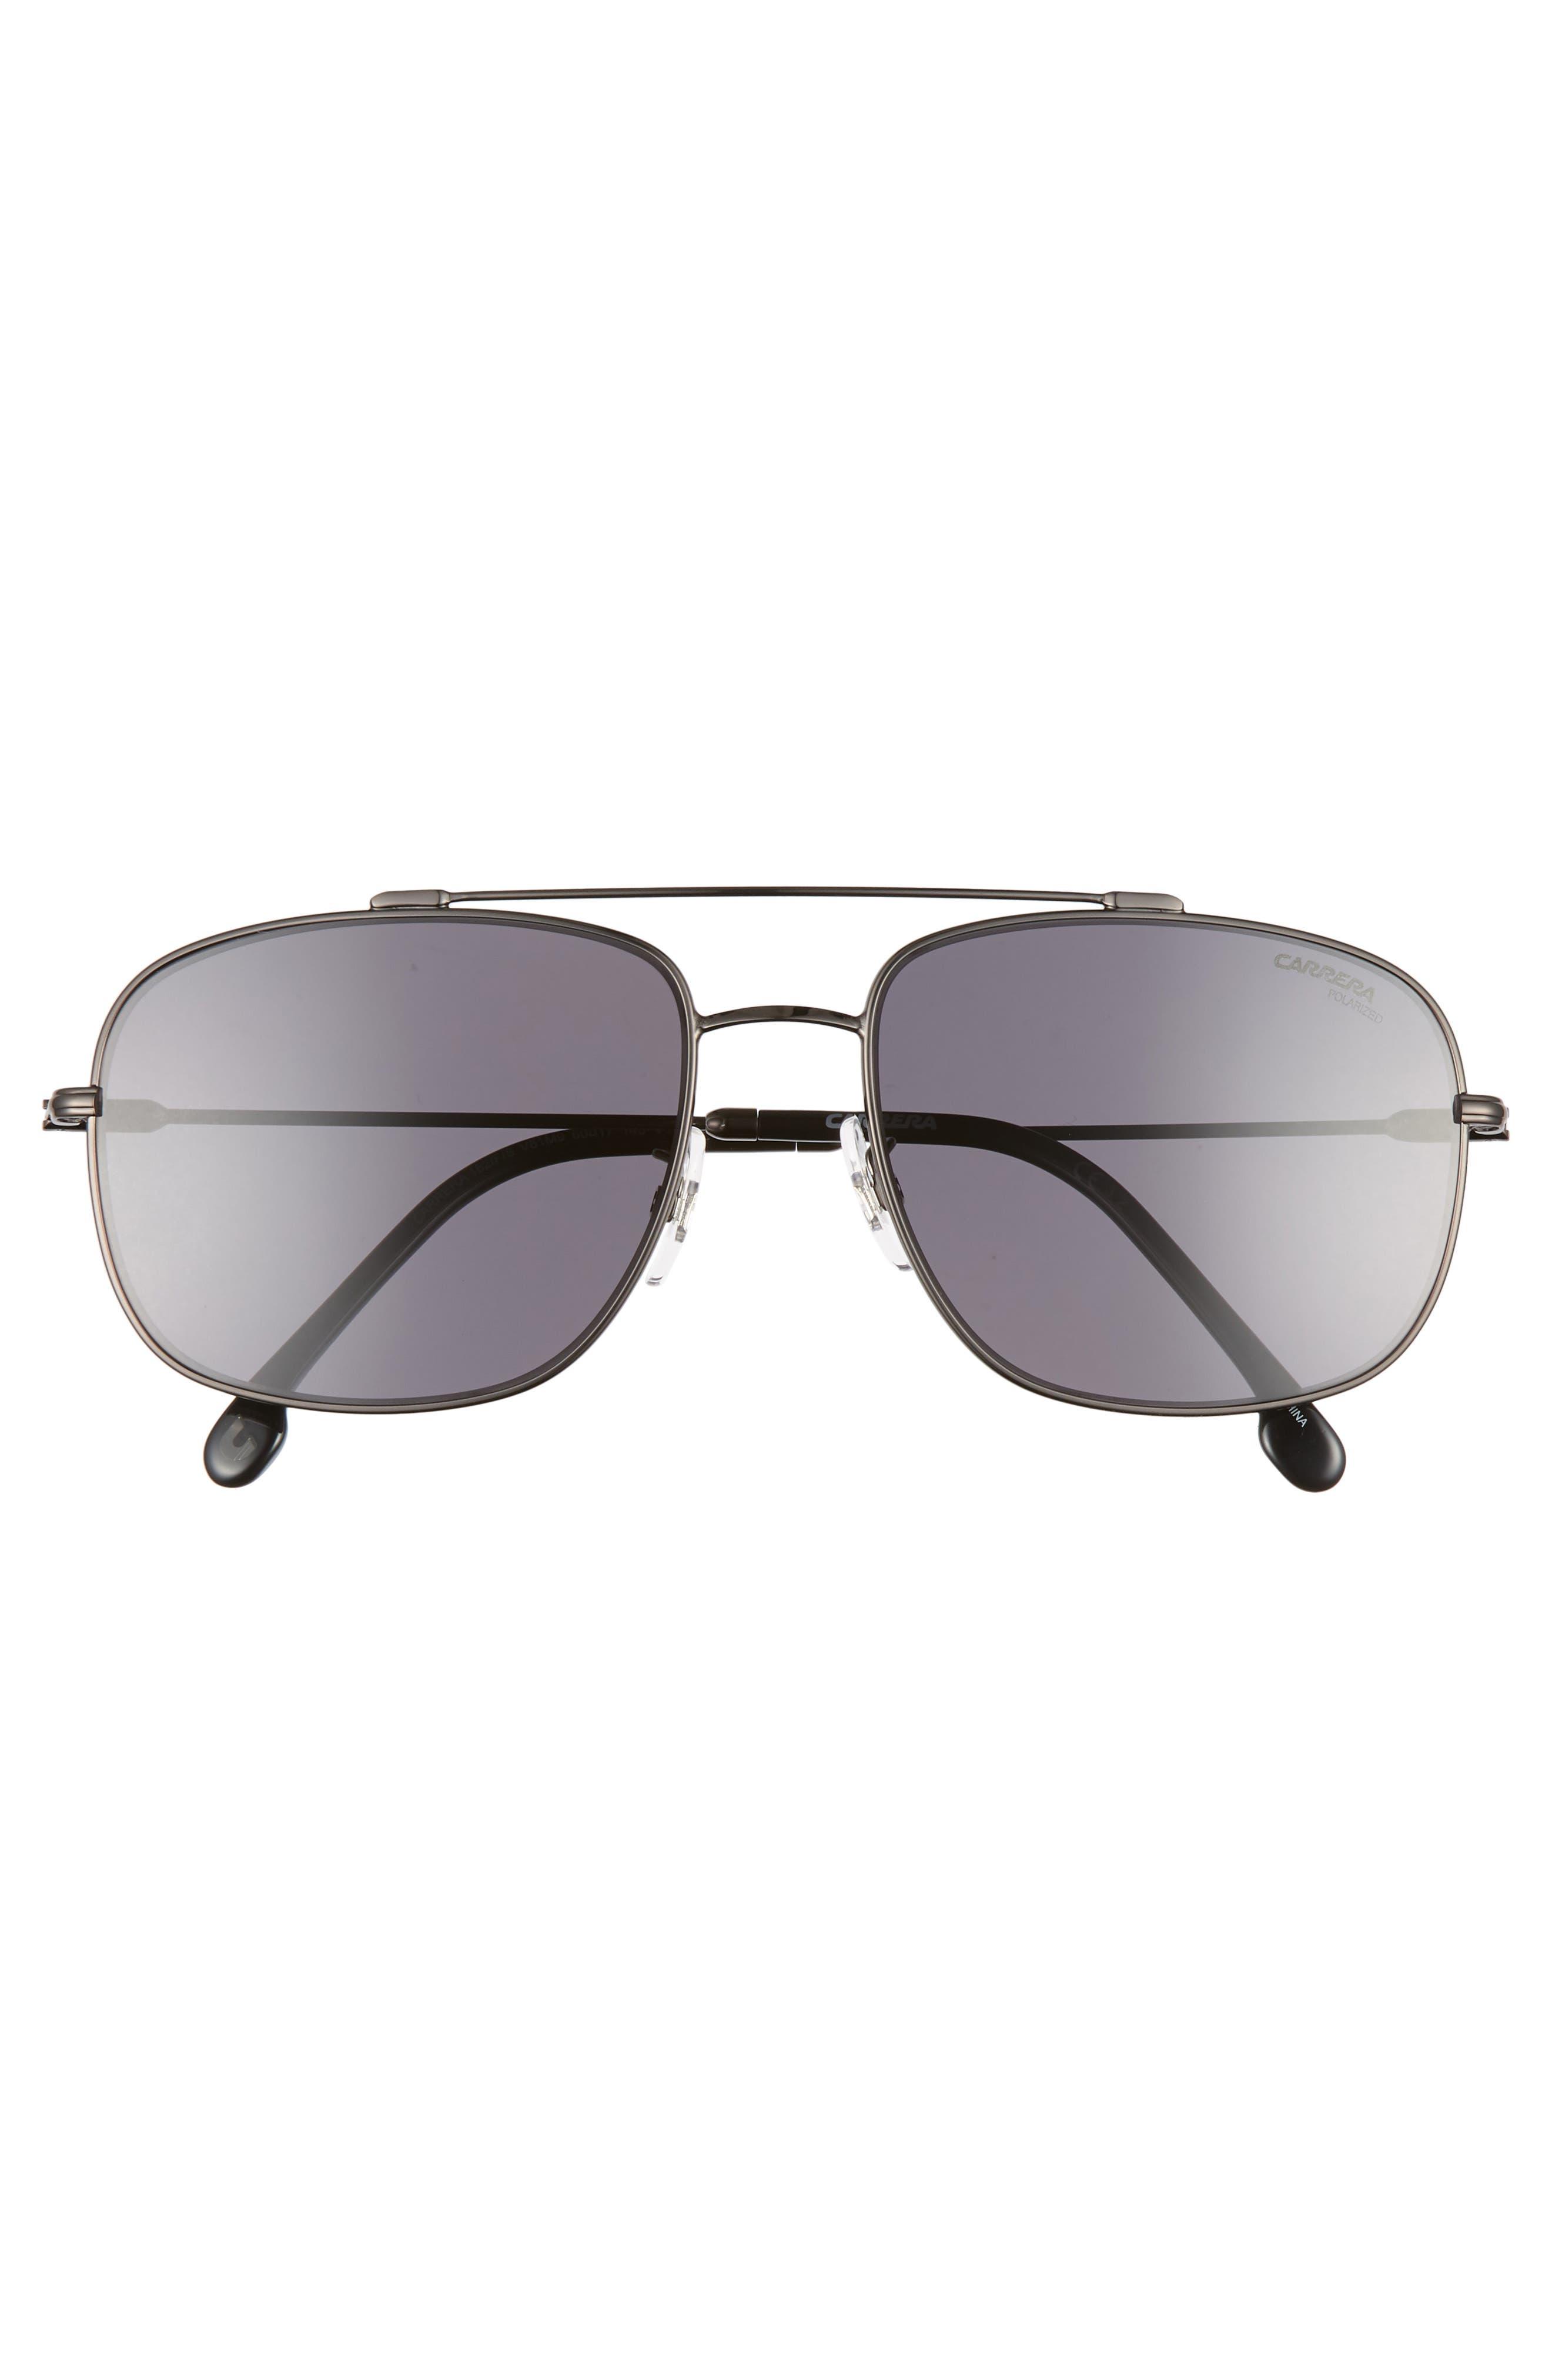 60mm Special Fit Polarized Navigator Sunglasses,                             Alternate thumbnail 2, color,                             DARK RUTHENIUM/ BLACK